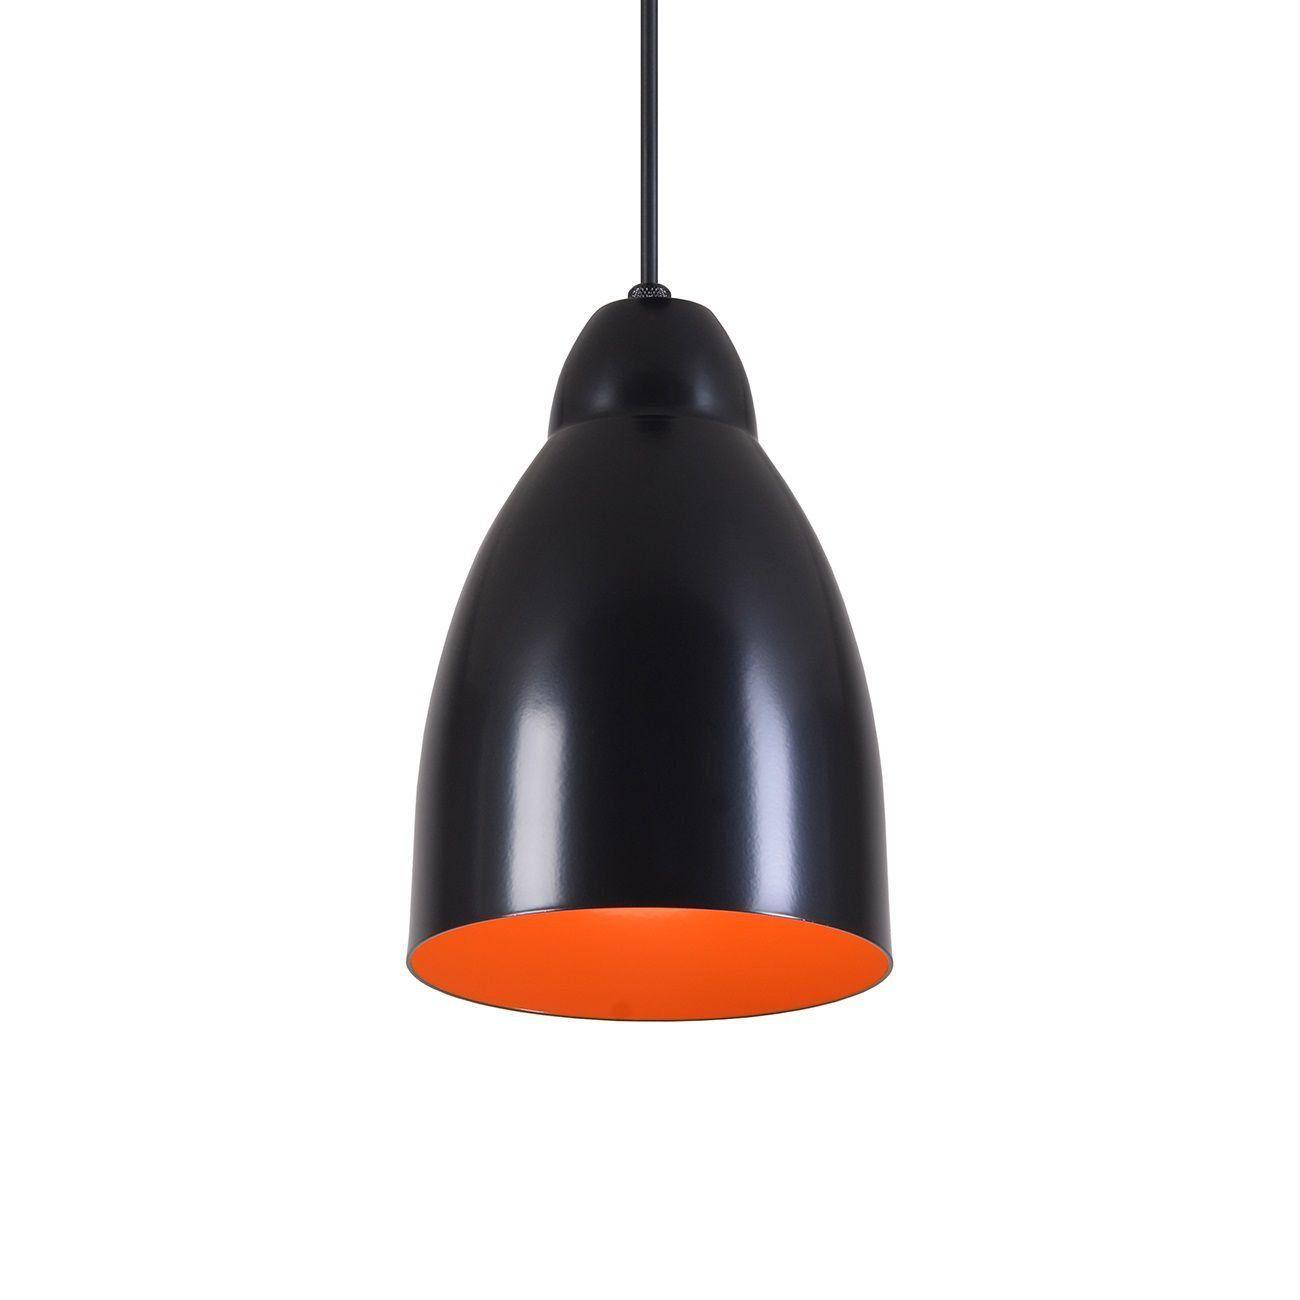 Pendente Bala Luminária Lustre Alumínio Preto Fosco C/ Laranja - Rei Da Iluminação